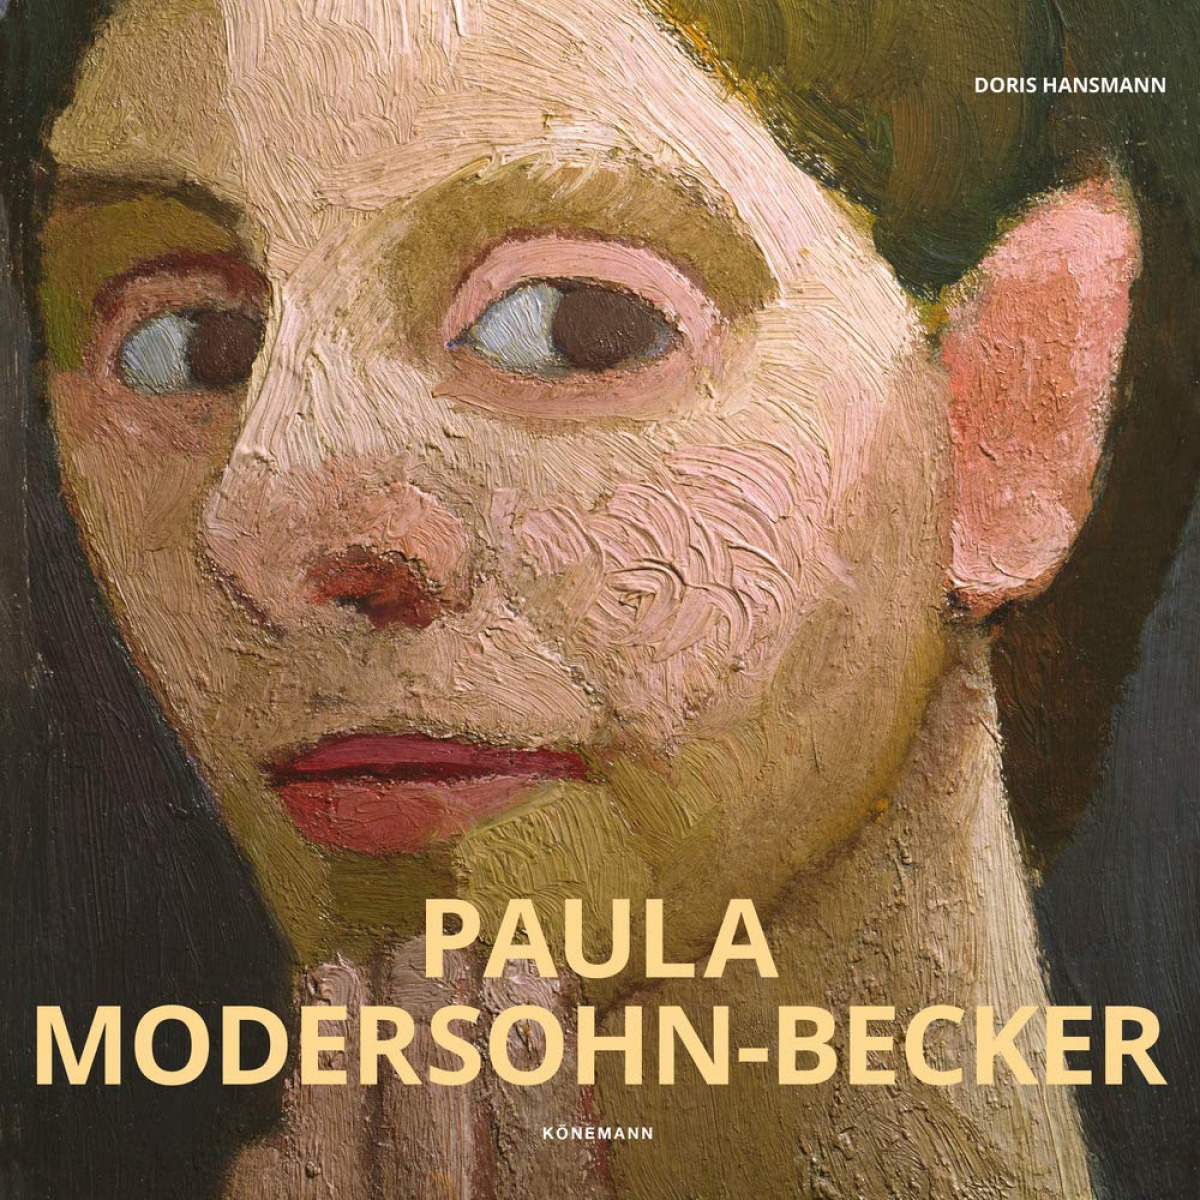 PAULA MODERSOHN-BECKER 9783741922169